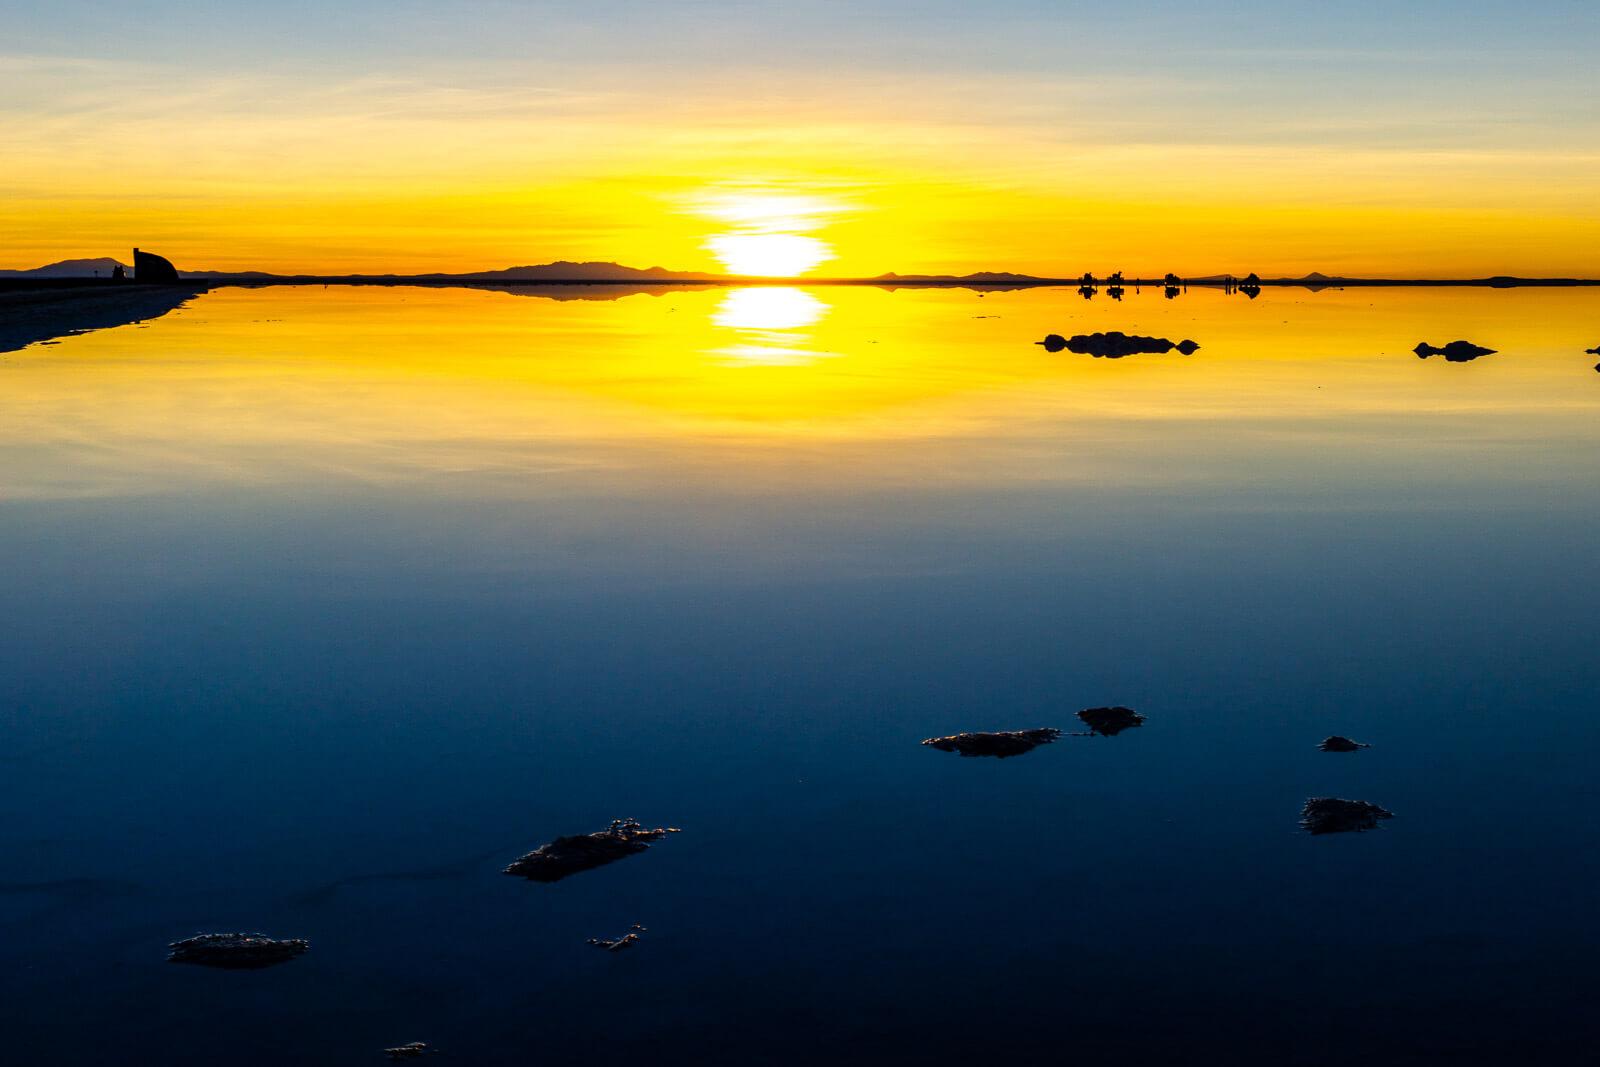 The sunrise reflections at the Salar de Uyuni in Bolivia